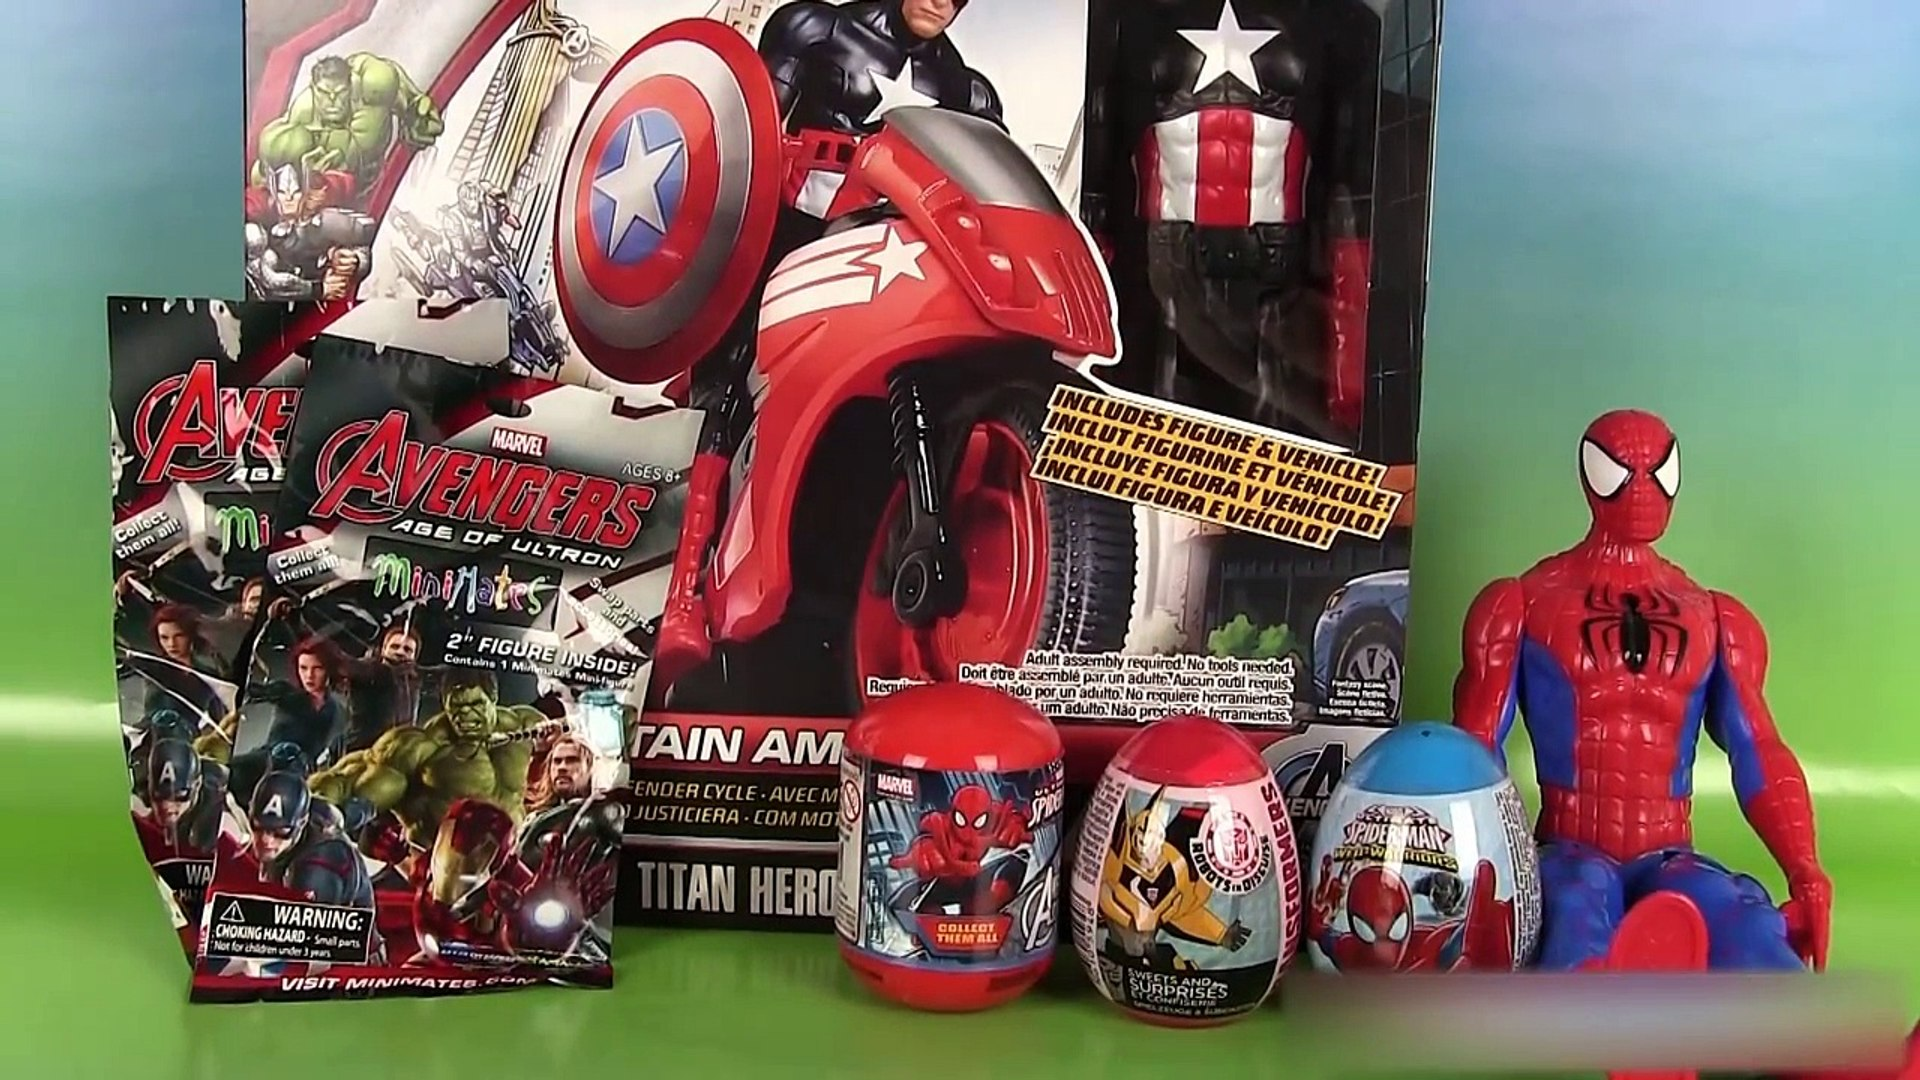 Moto Marvel Eggs Défense Bike Defender Avengers Cycle Surprise America Oeufs Capitaine QWEdCxerBo